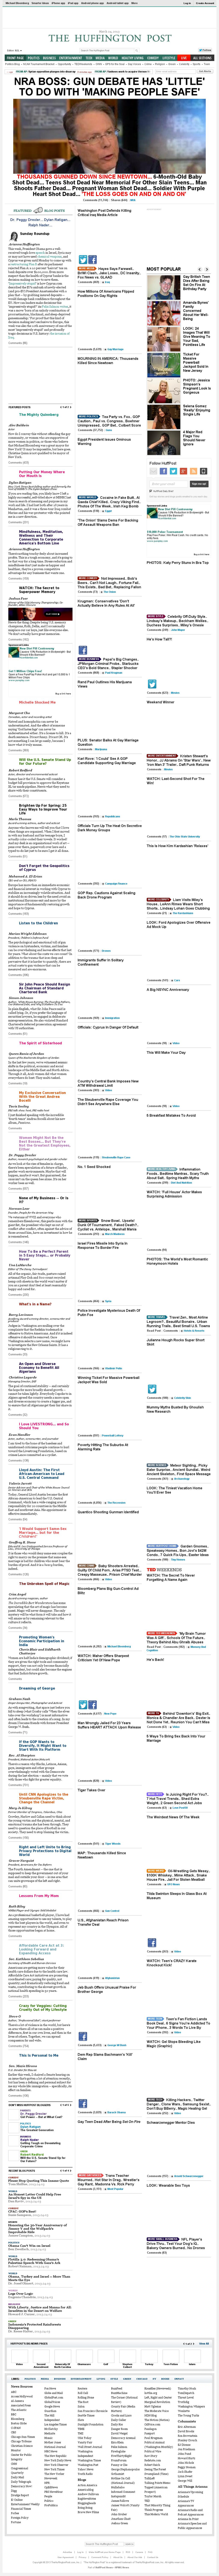 The Huffington Post at Sunday March 24, 2013, 9:19 p.m. UTC